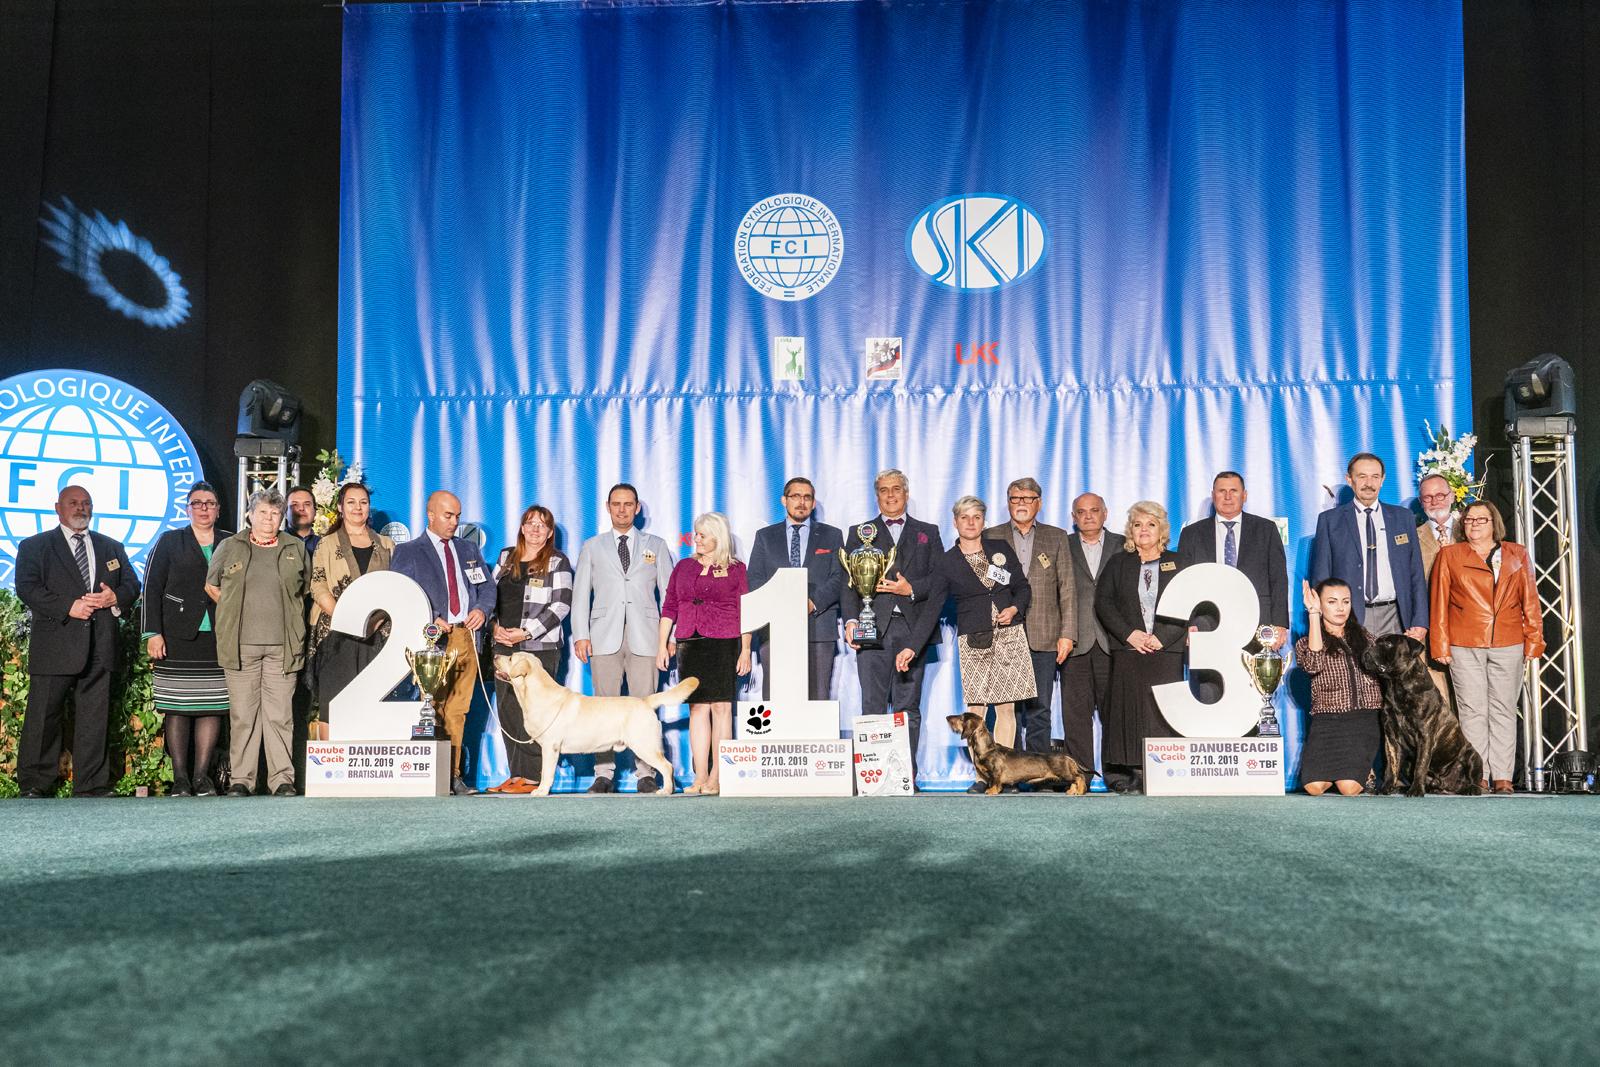 BIS at the IDS Bratislava • 27/10/2019